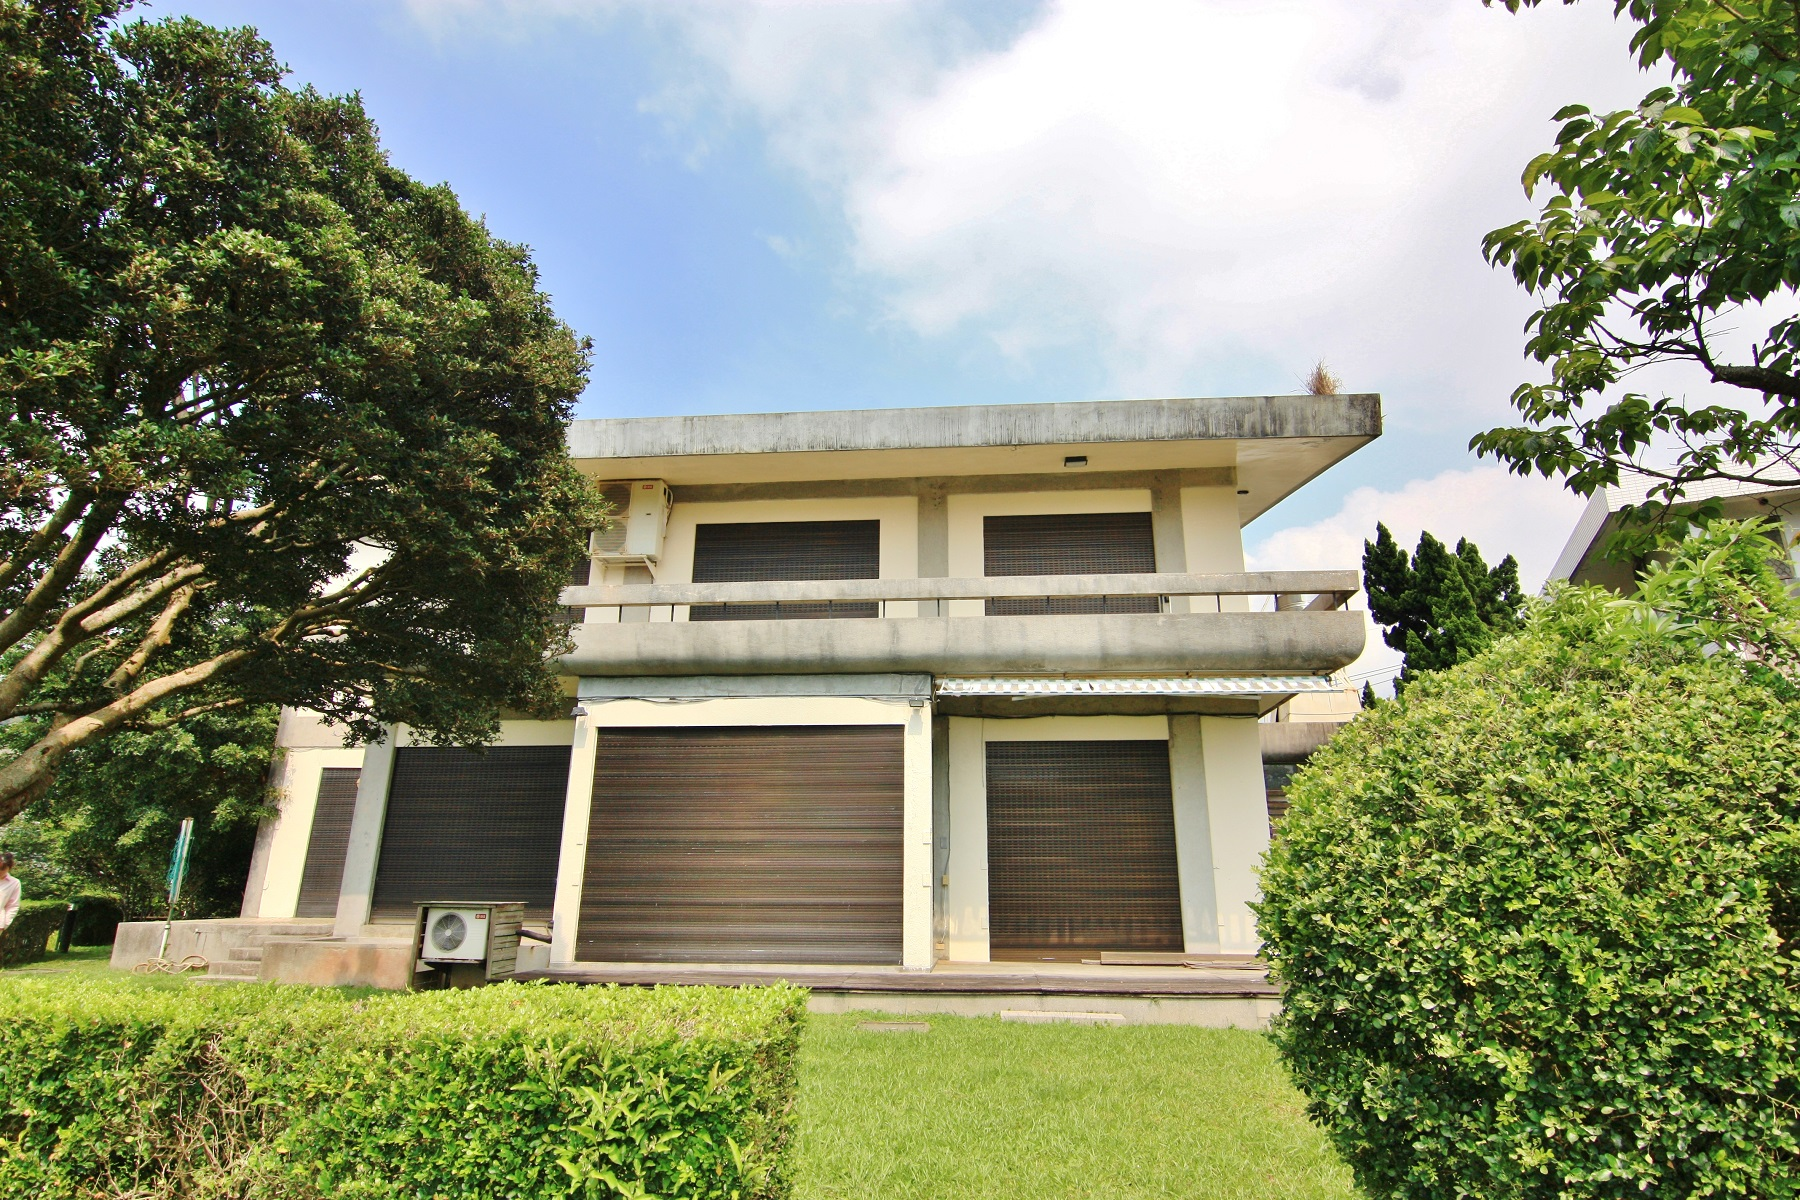 Single Family Homes for Sale at Yangming Bungalow Yonggong Rd., Shilin Dist. Taipei City, Taiwan 111 Taiwan